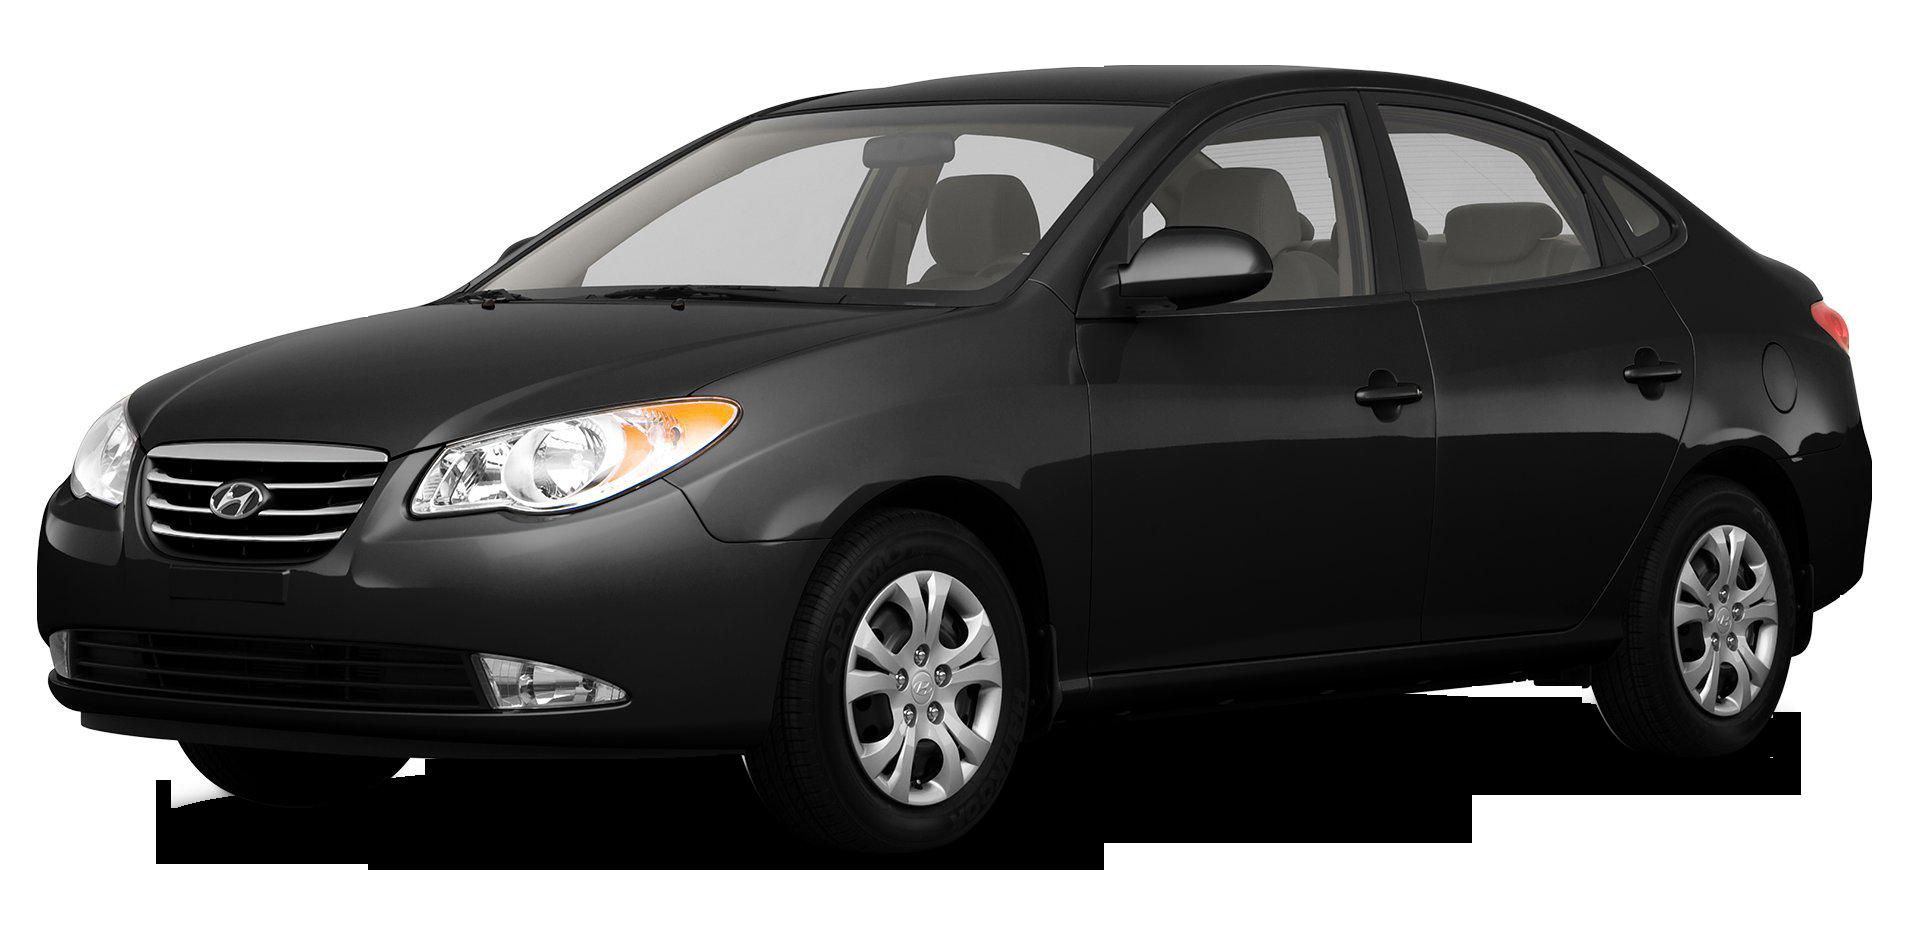 Nissan Versa El Cajon 16 Air Conditioning Cars In Mitula